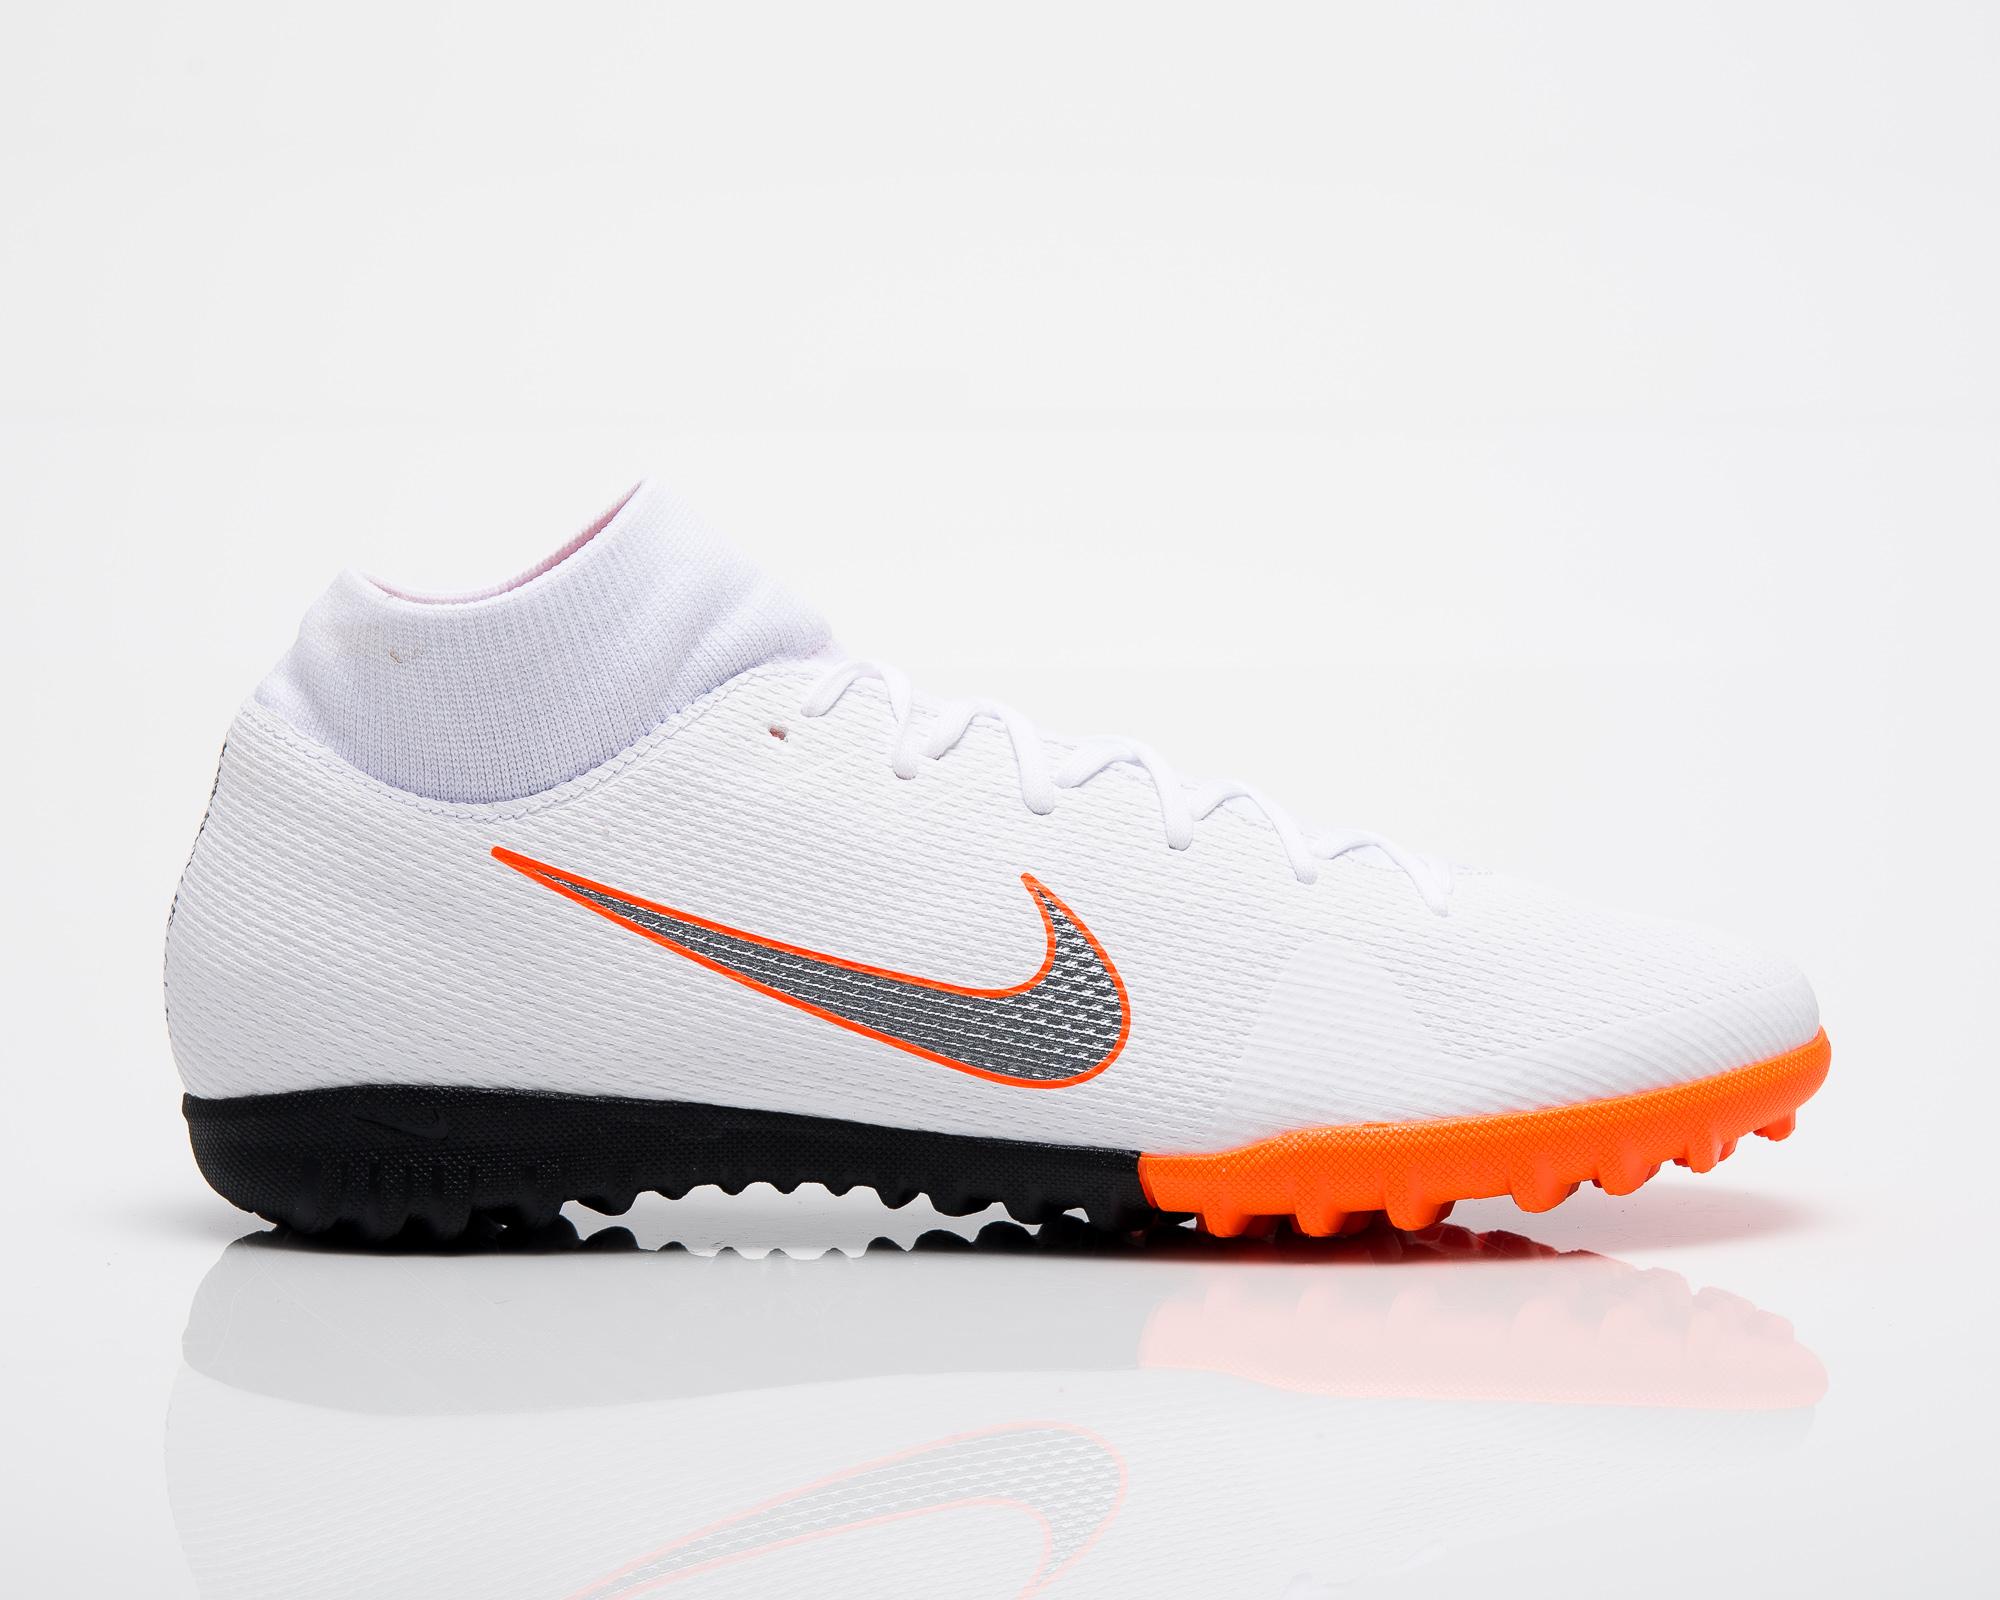 552bda45f Nike MercurialX Superfly VI Academy TF - Shoes Soccer - Sporting ...